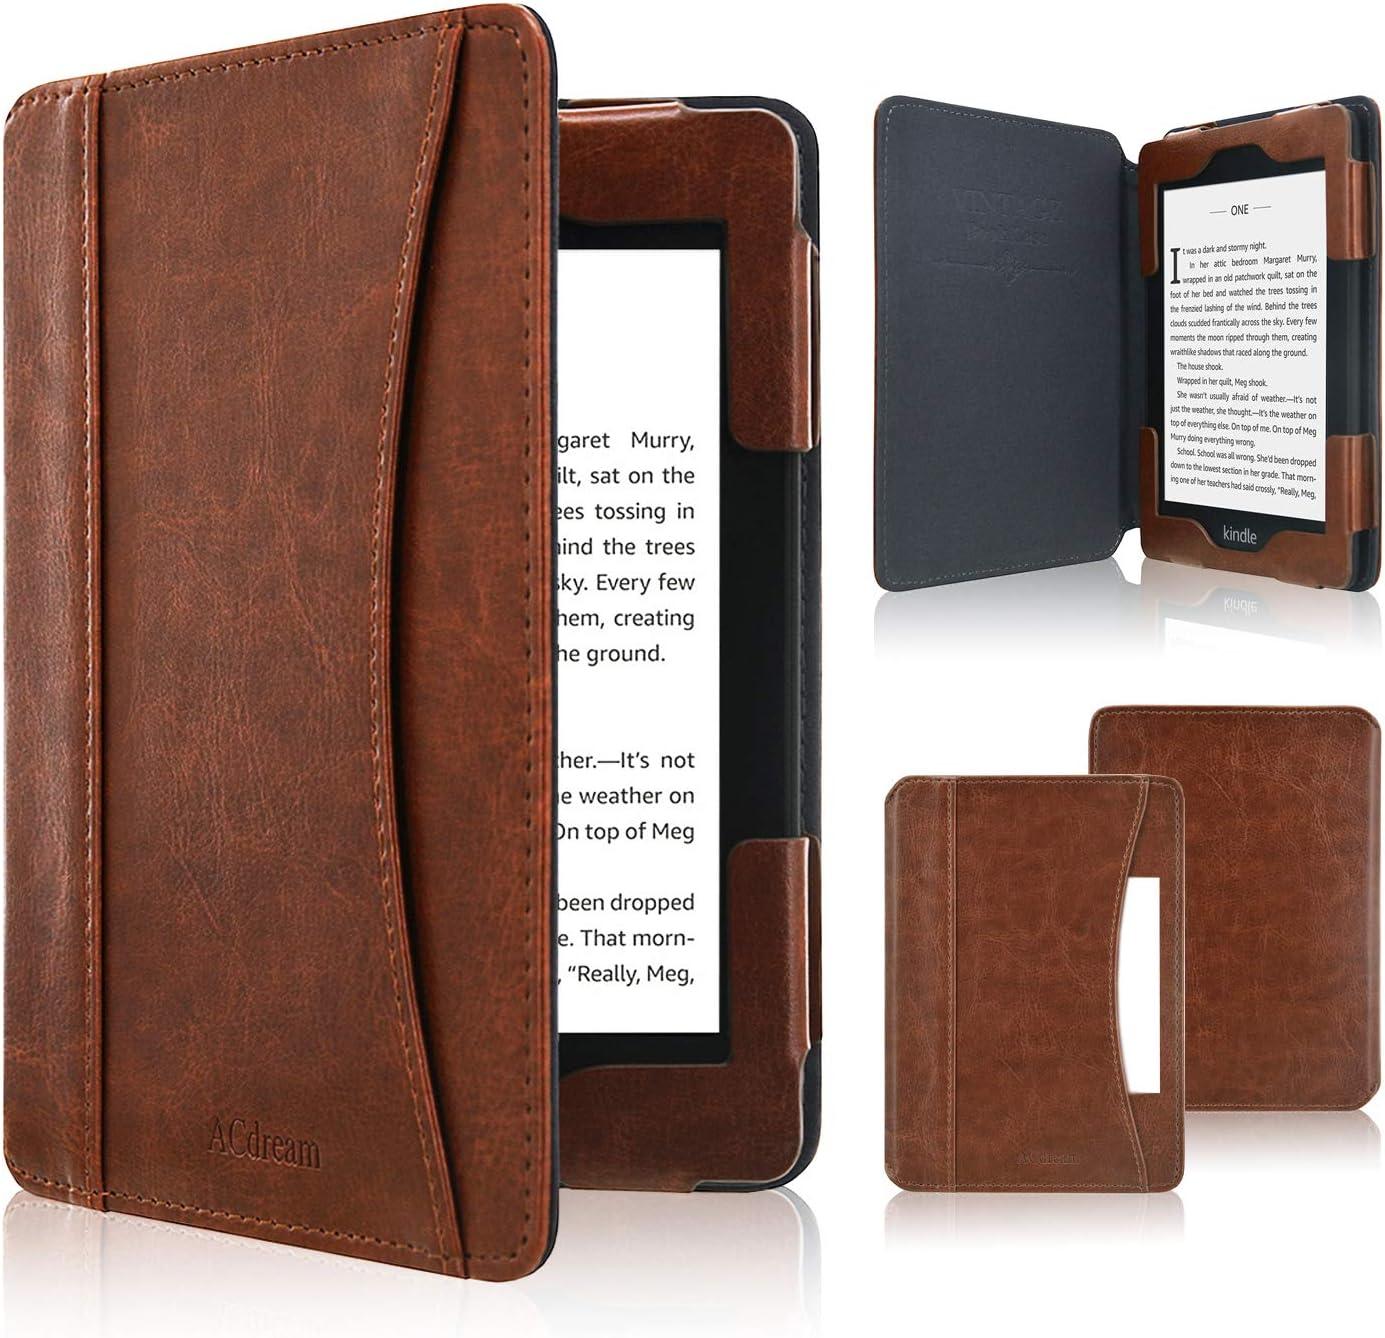 ACdream Kindle New York Mall Paperwhite Case 2018 Smart C Cover Virginia Beach Mall Folio Leather